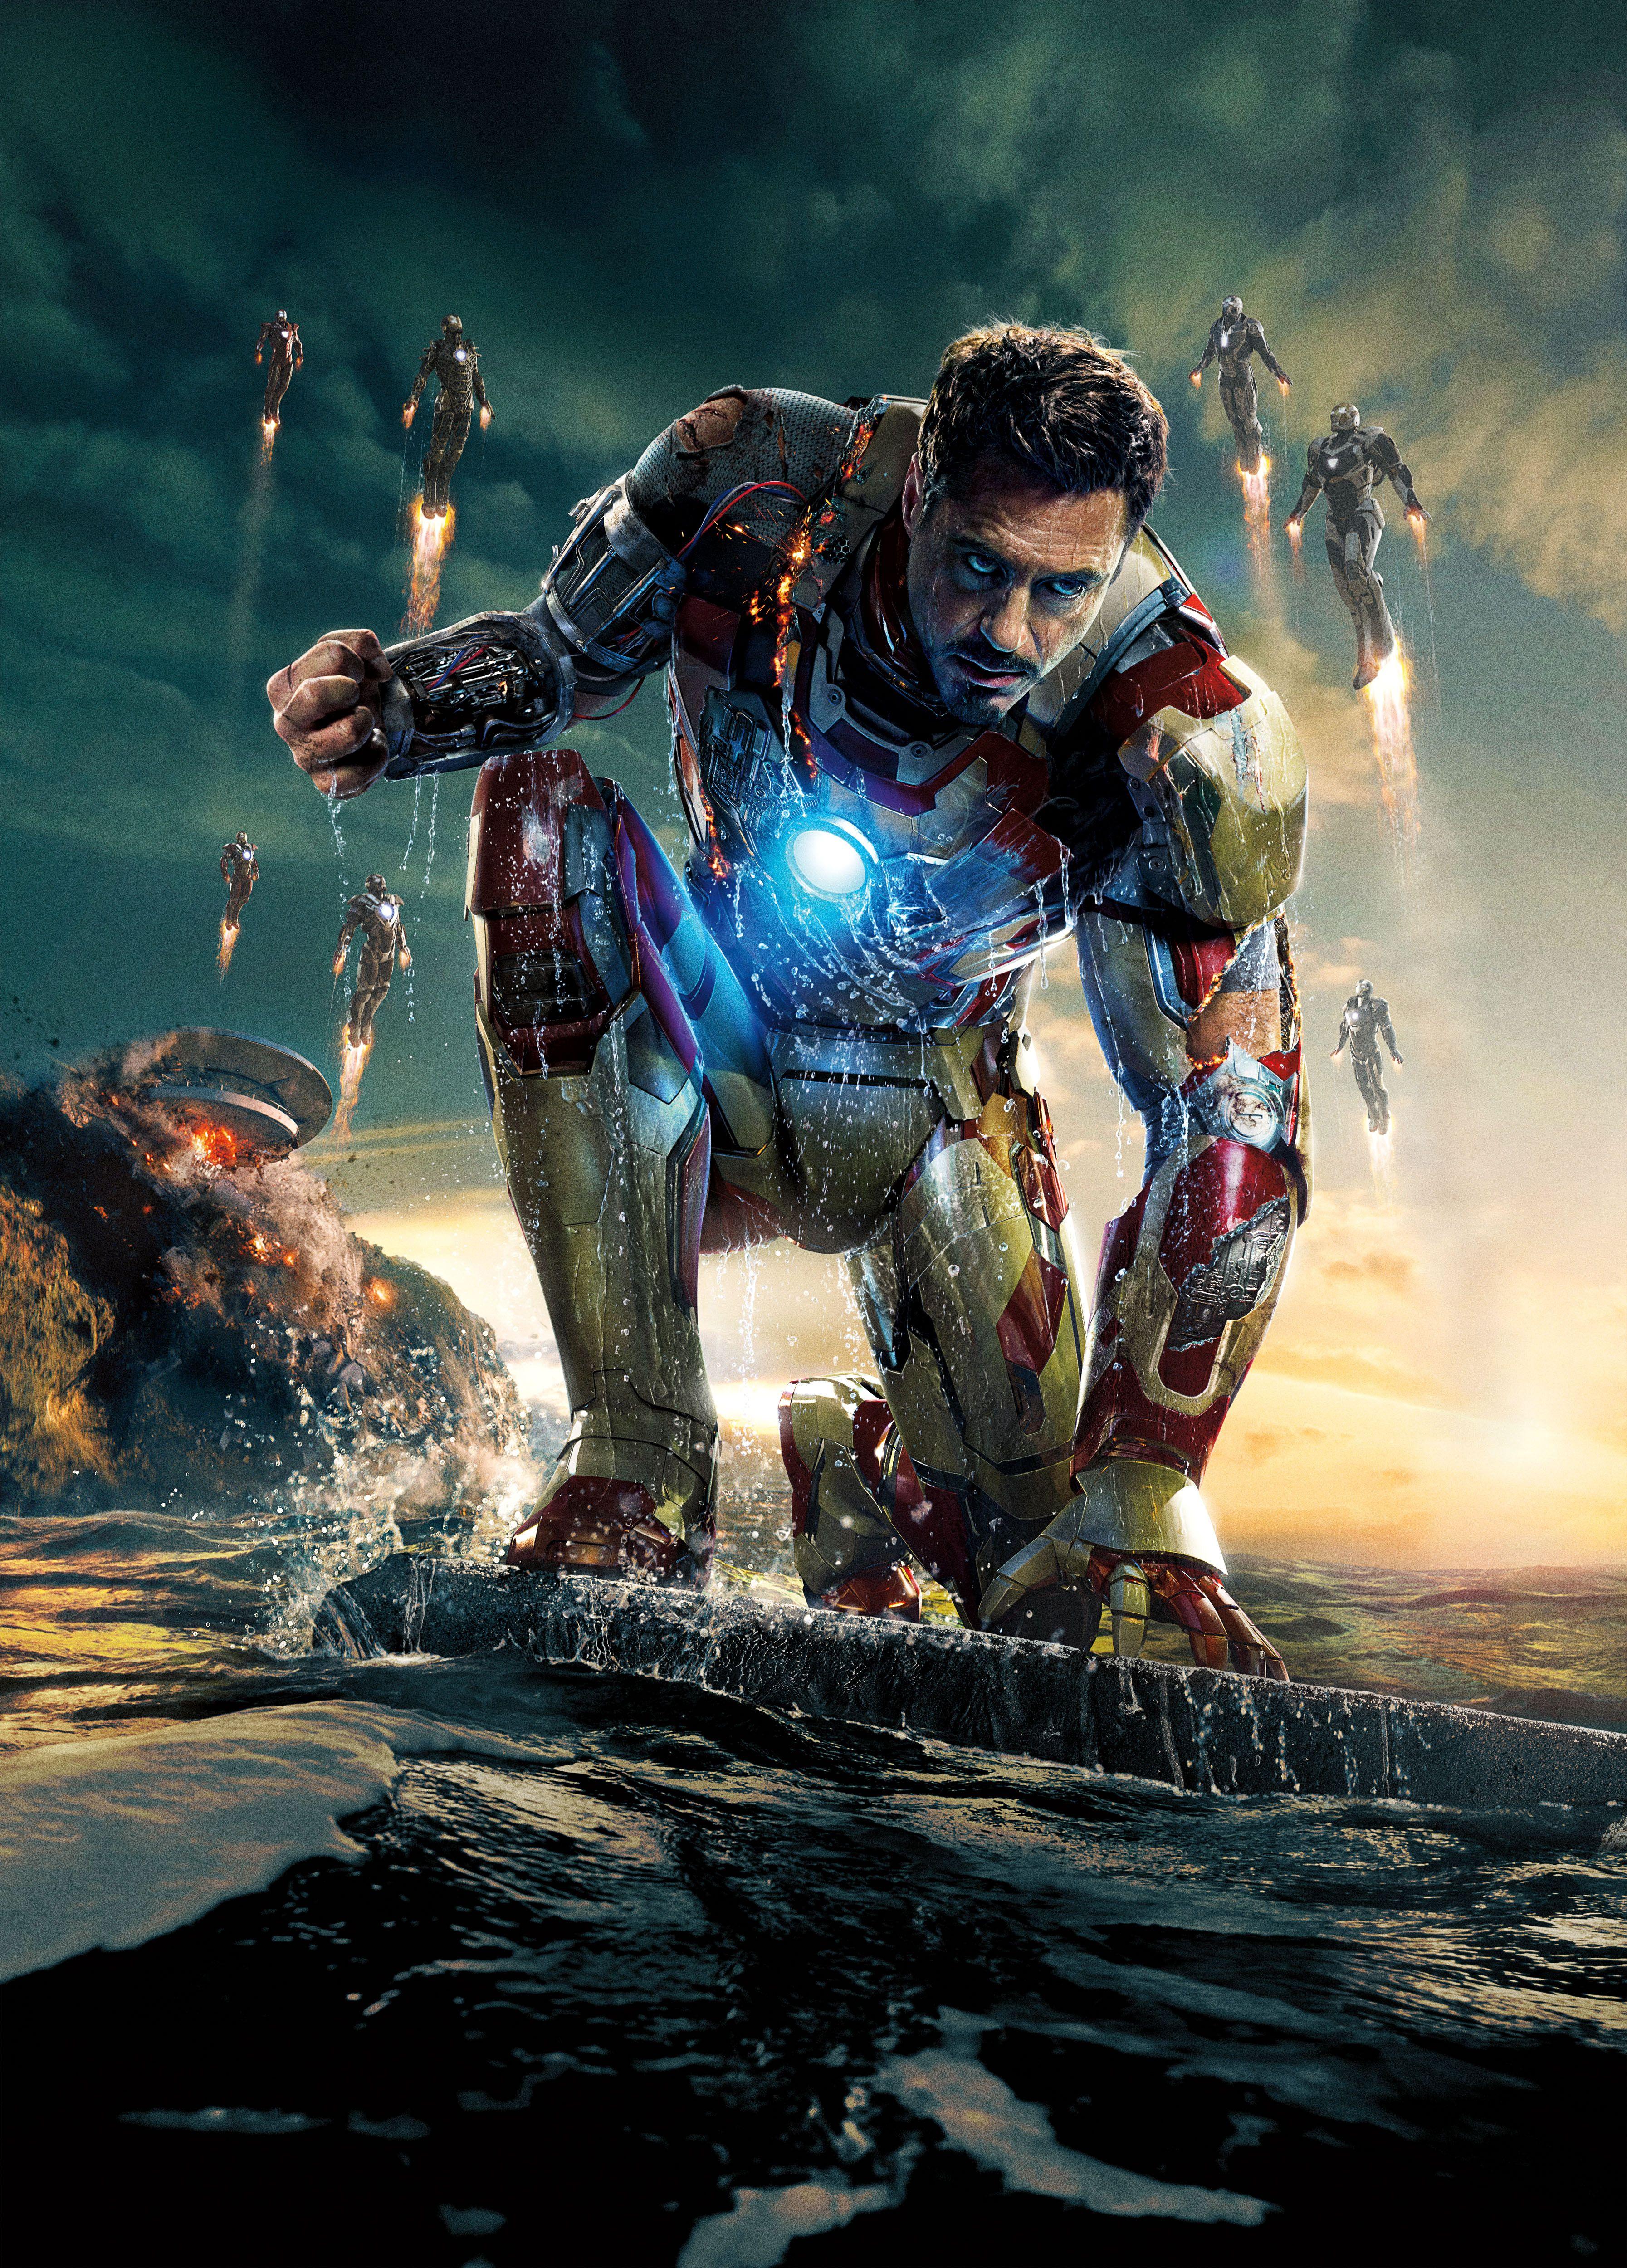 Iron man 3 iron man 3 poster marvel iron man new iron man